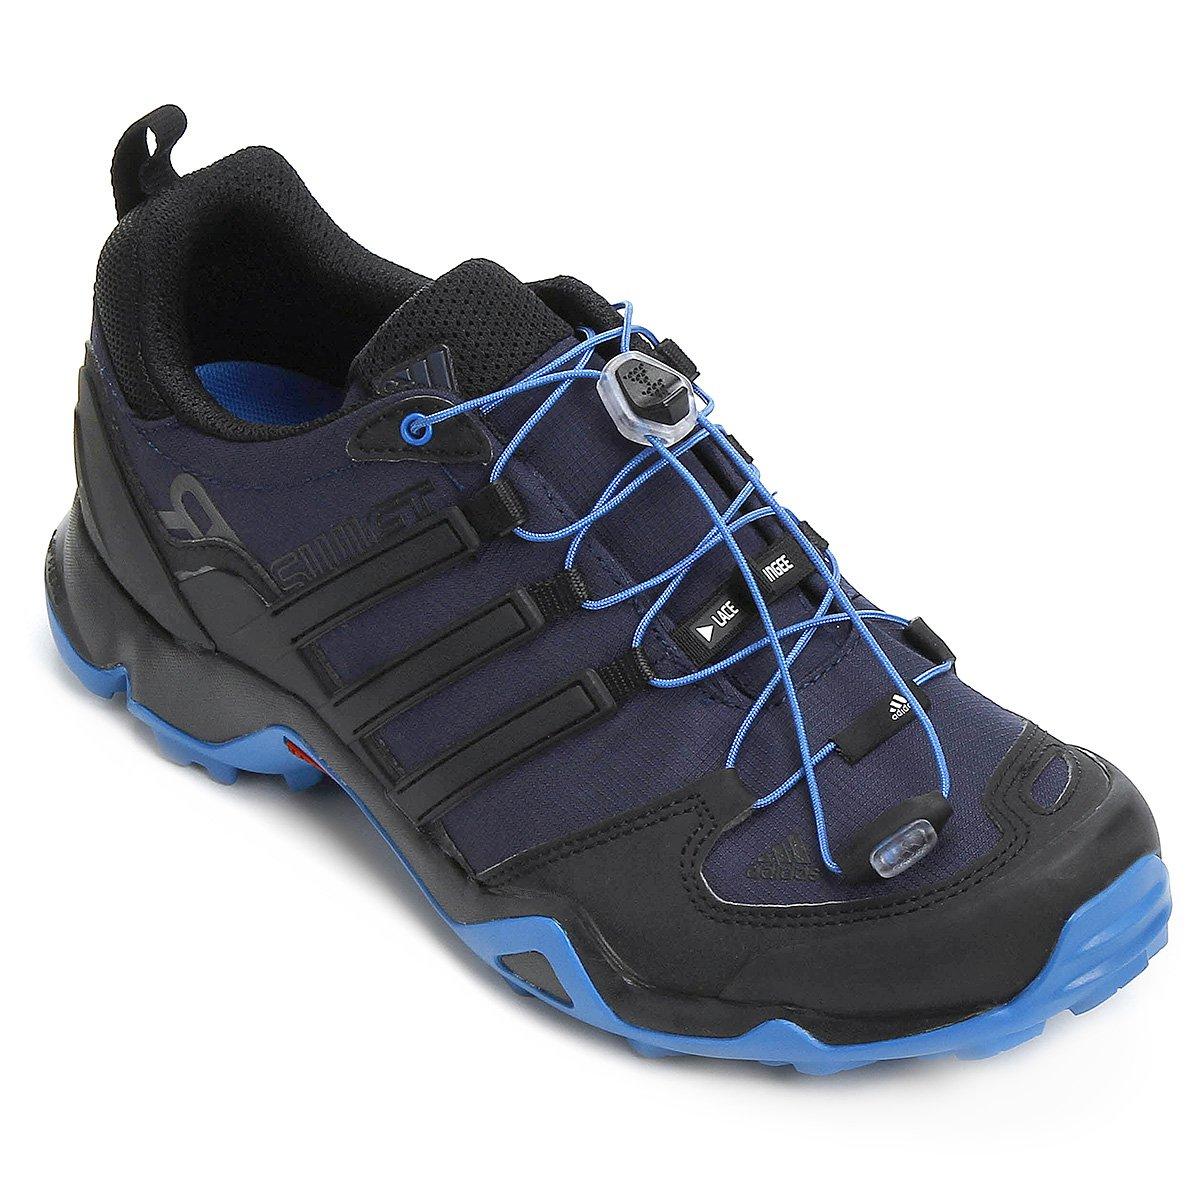 bb99b3d78 Tênis Adidas Terrex Swift R - Compre Agora